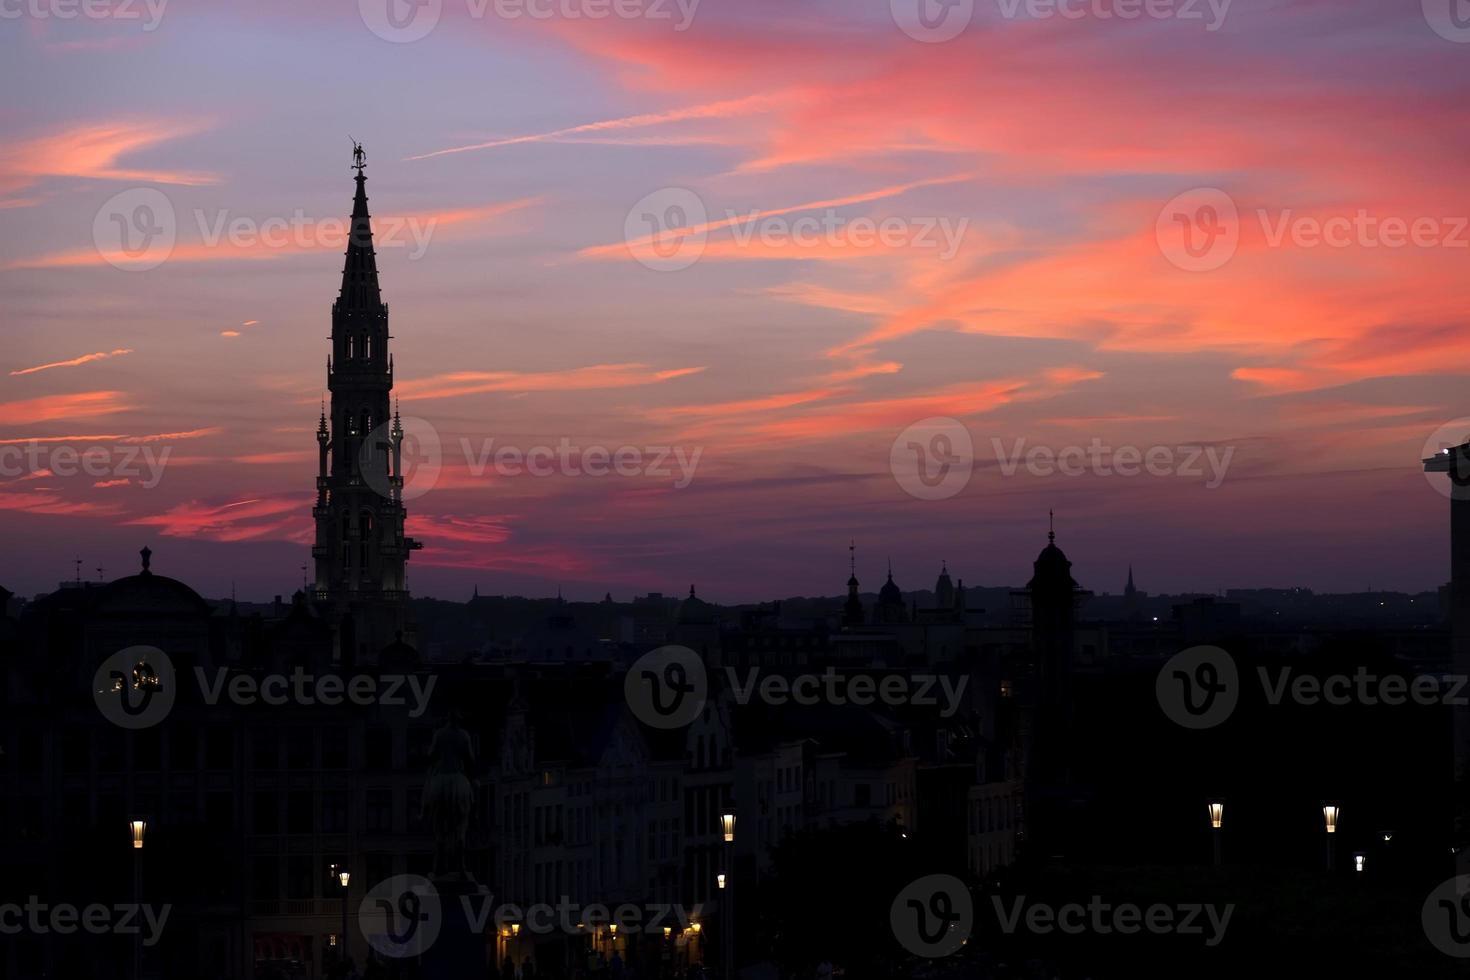 kathedraal silhouet bij zonsondergang, Brussel, België foto